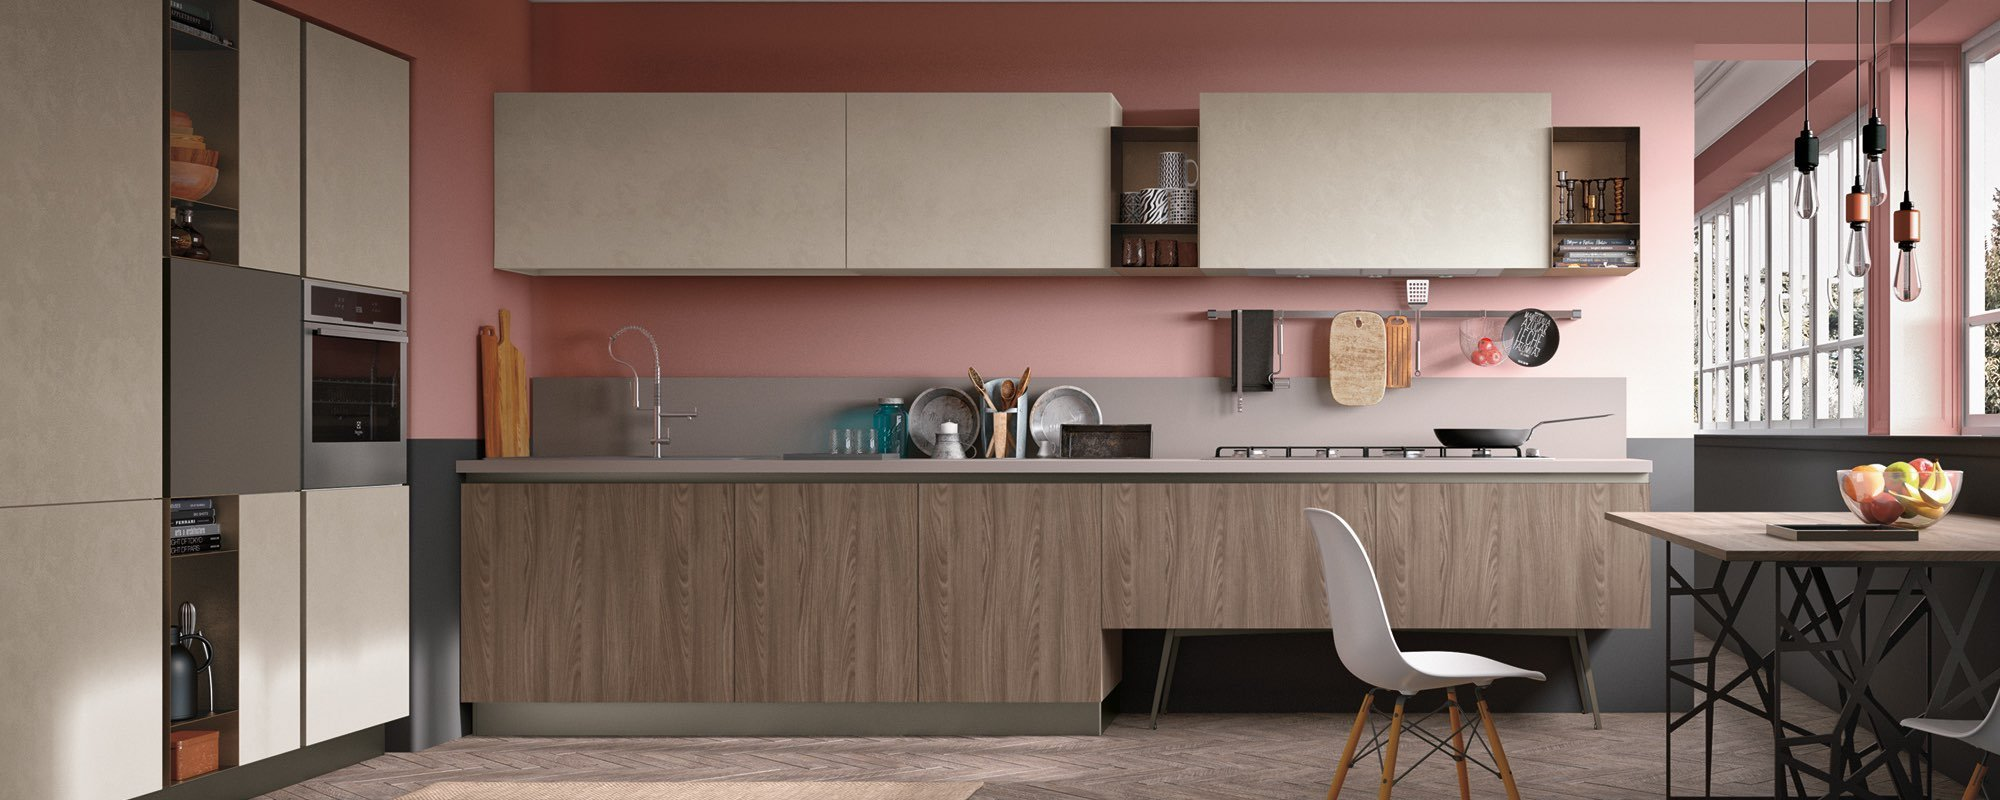 cucina arredamento color rovere deserto